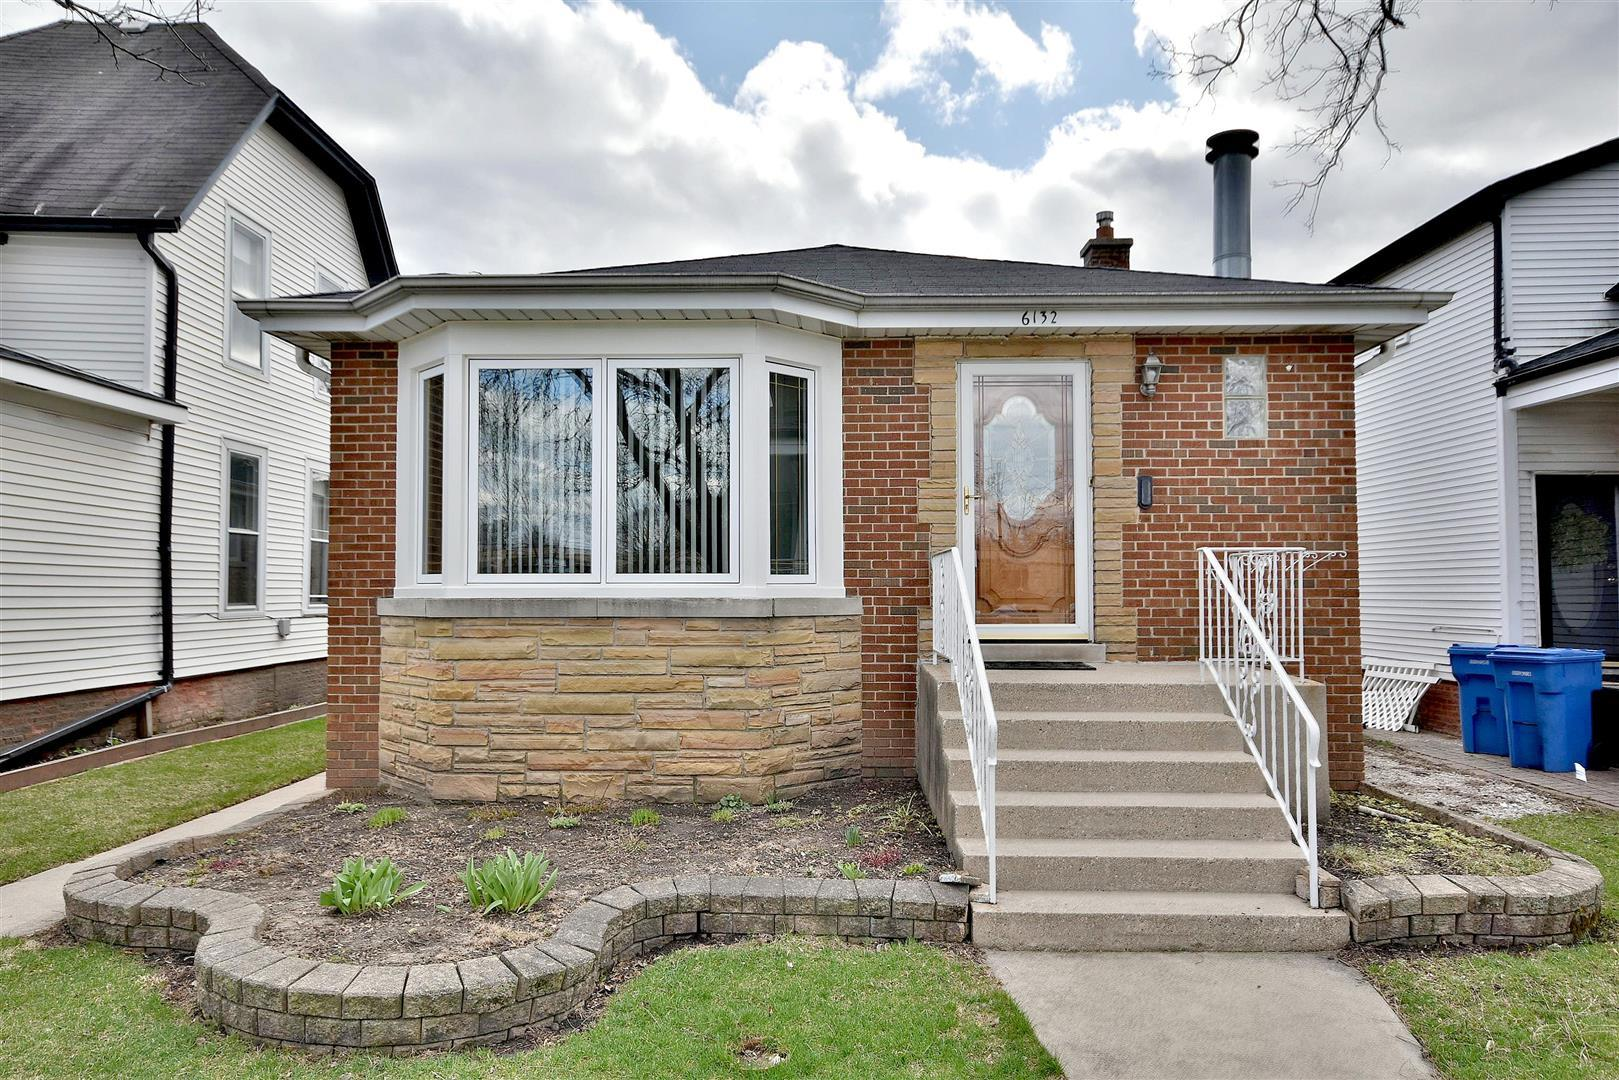 6132 North Avondale Avenue, Chicago-Edison Park in Cook County, IL 60631 Home for Sale